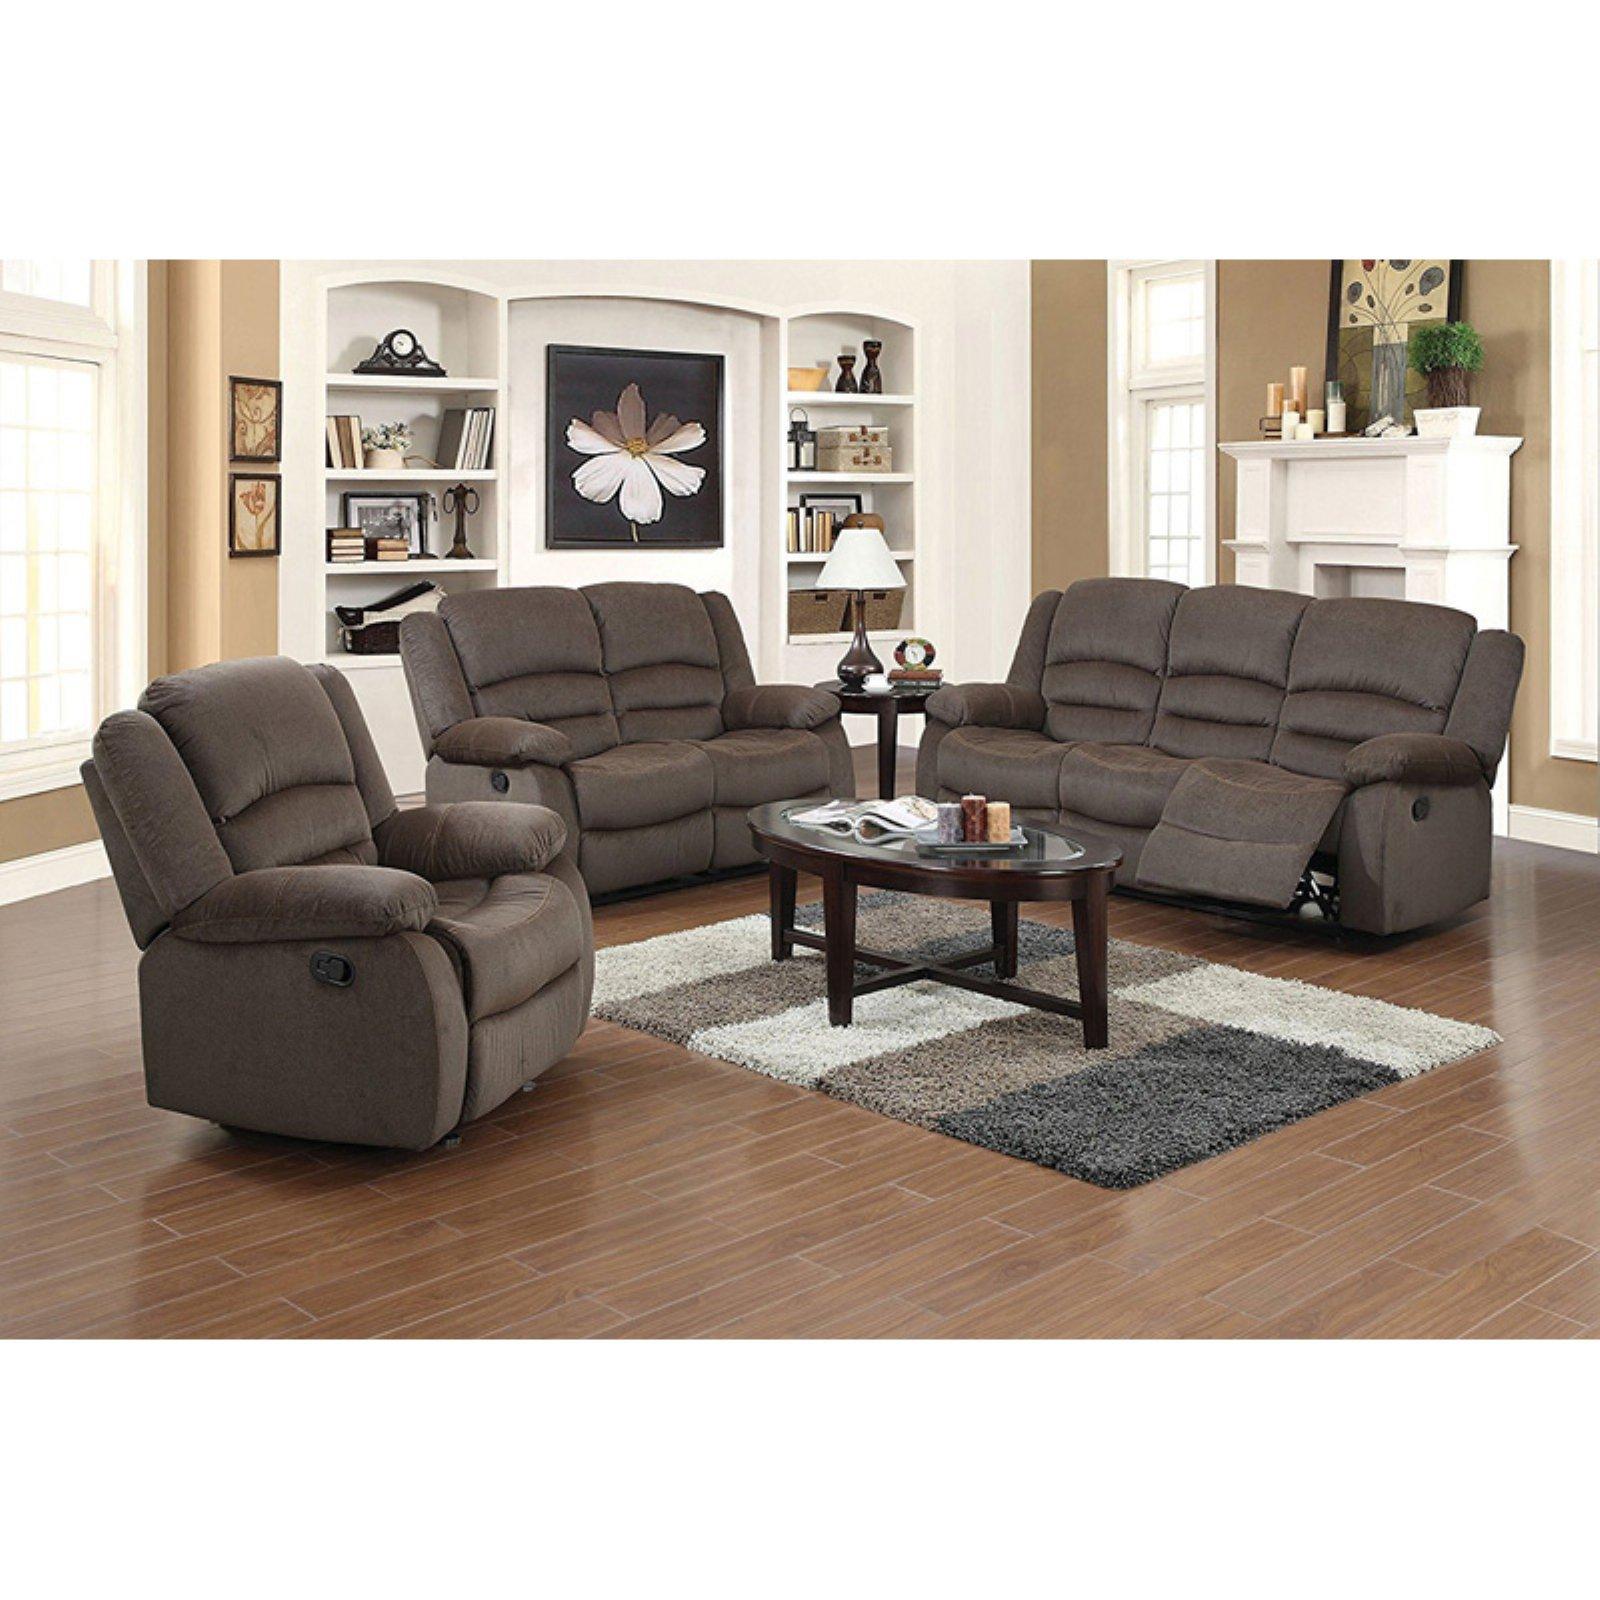 U.S. Pride Furniture Dallas 3 Piece Reclining Sofa Set